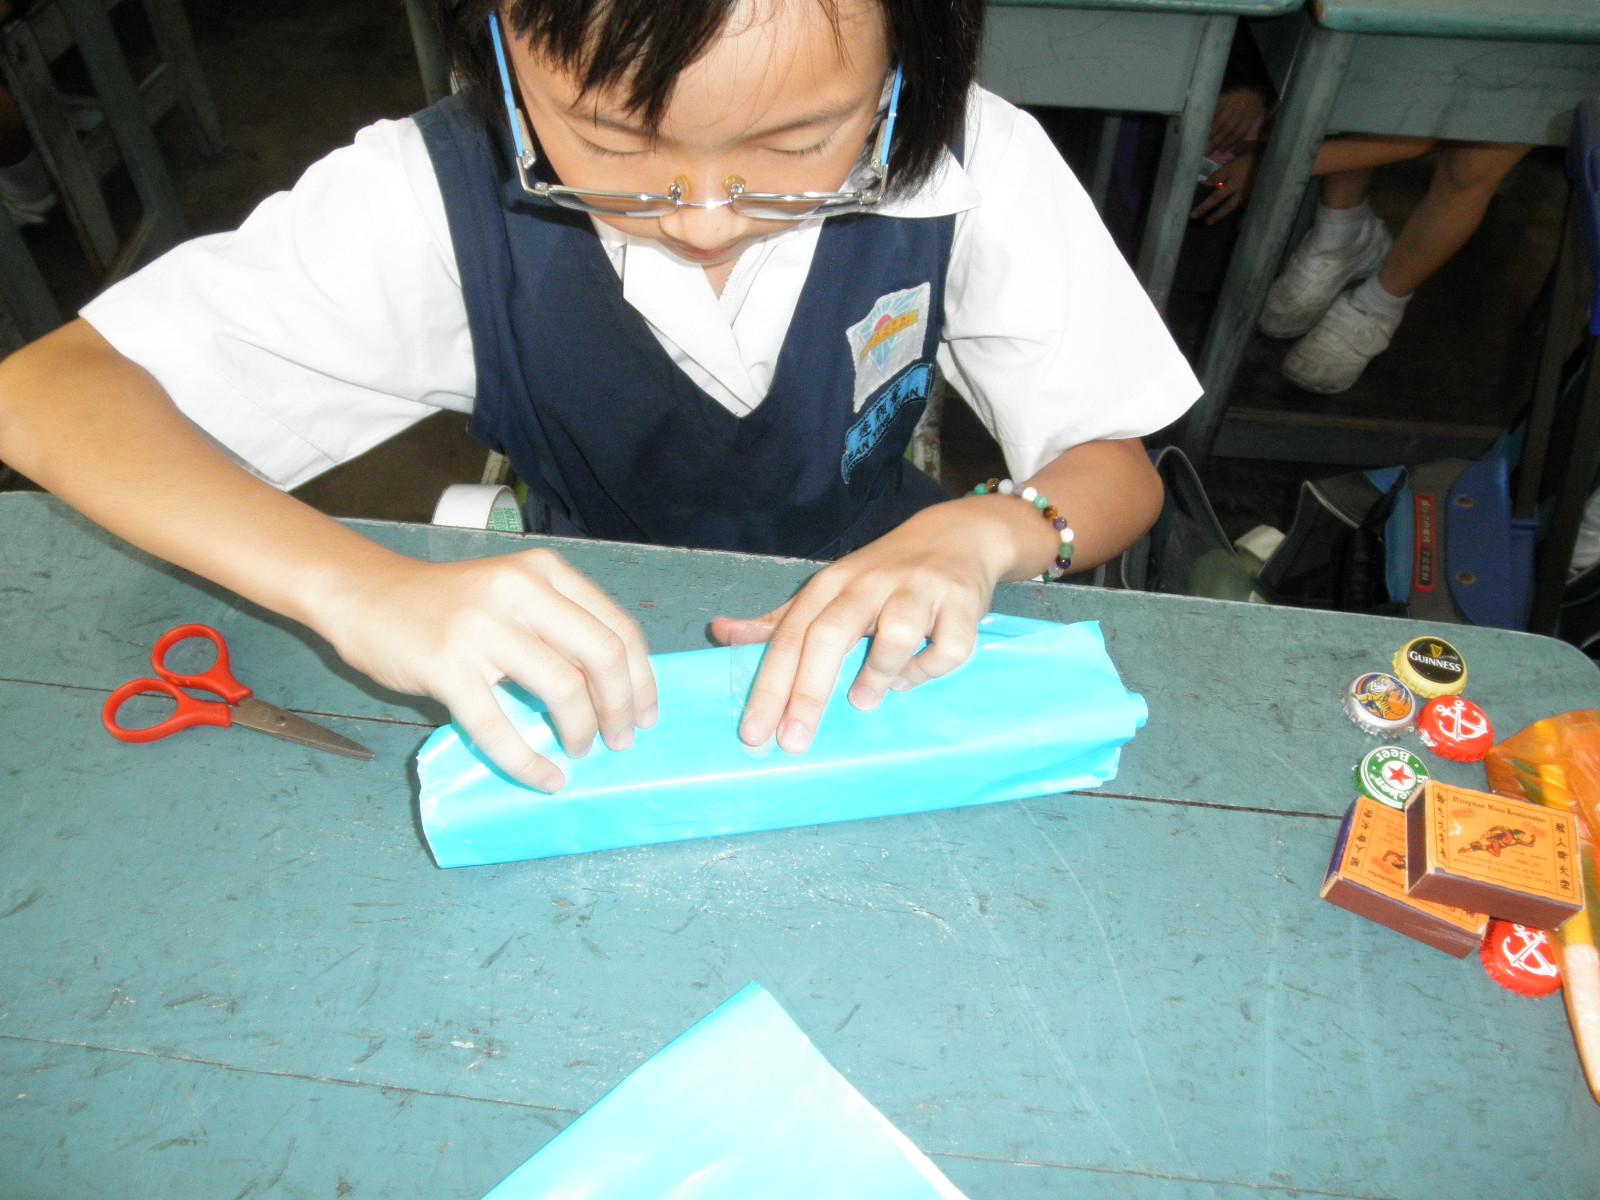 Murid meratakan gam dan membalut kotak menggunakan kertas warna